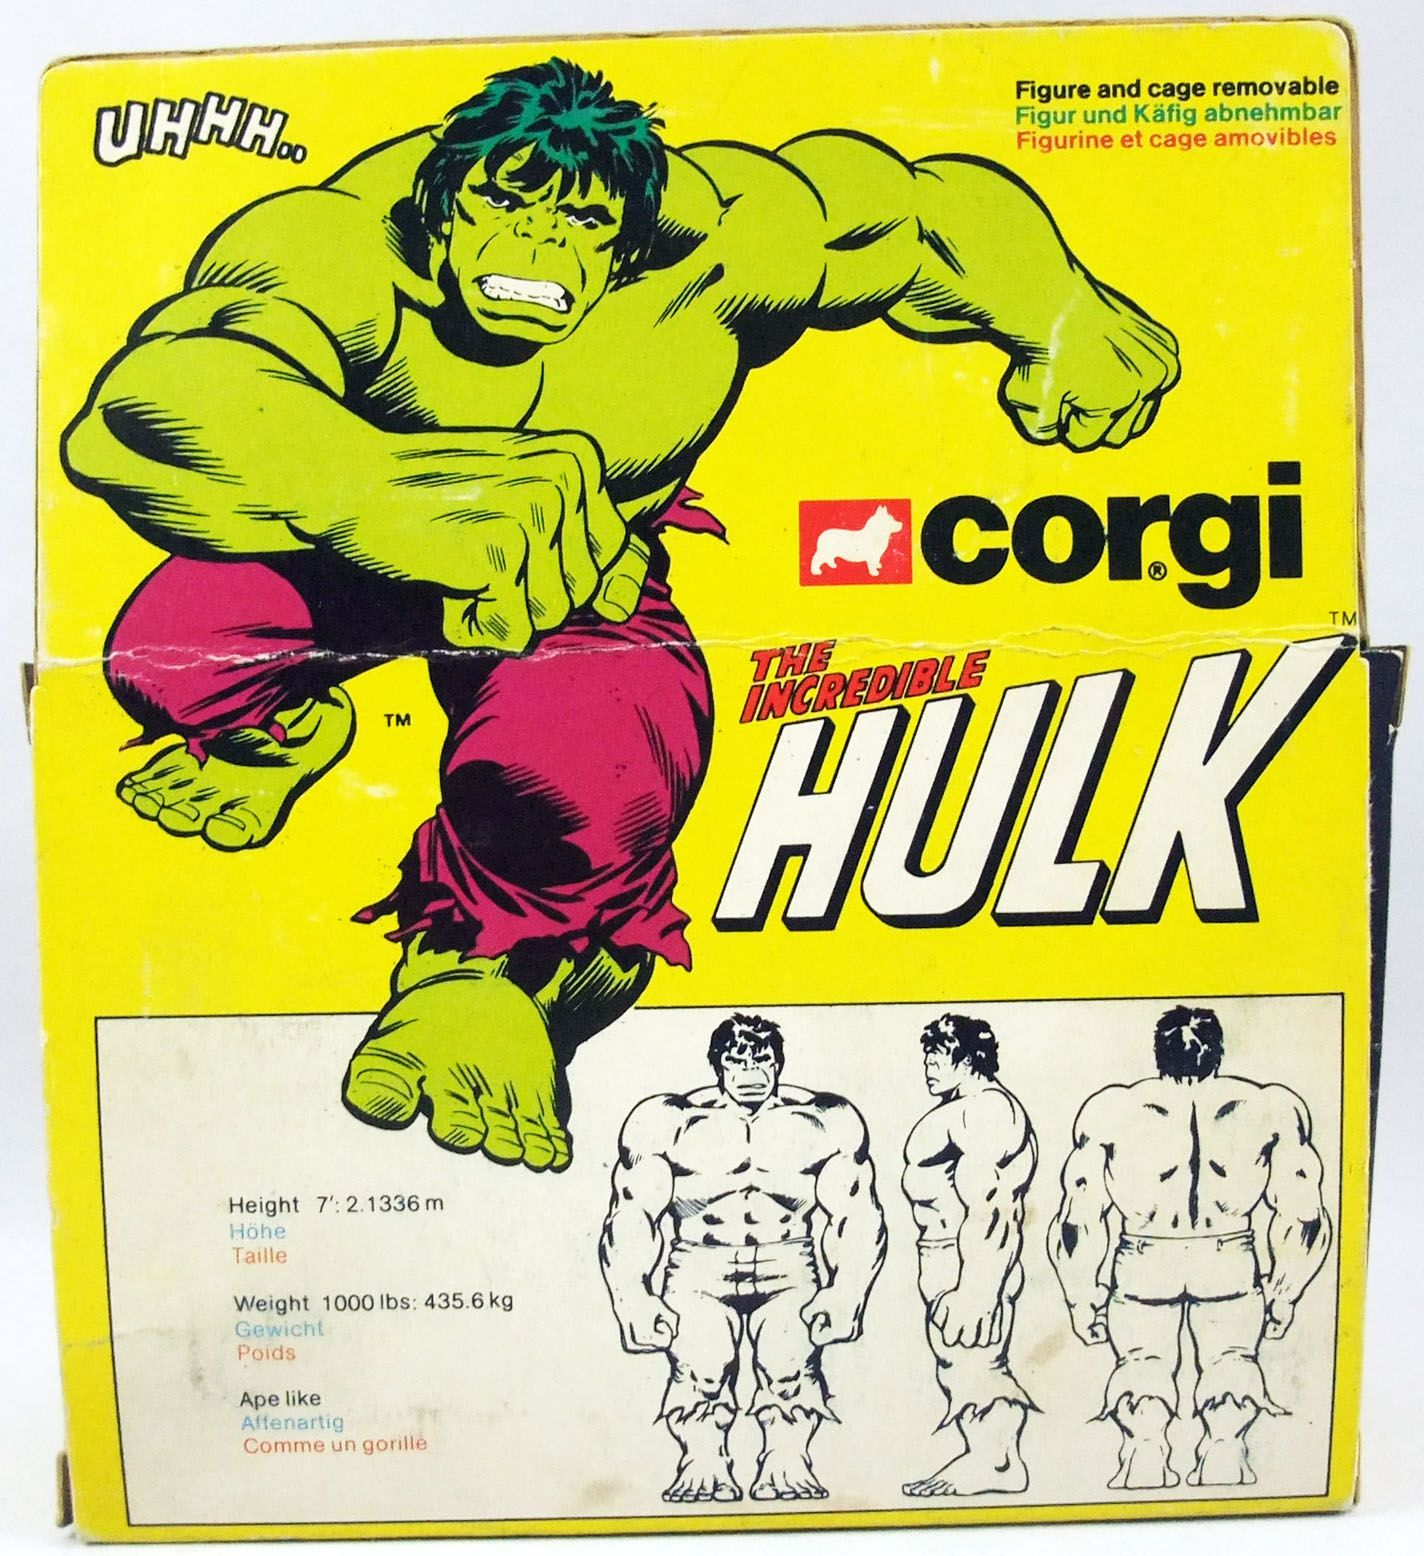 Hulk - Corgi ref. 264 - The Incredible Hulk (neuf en boite)